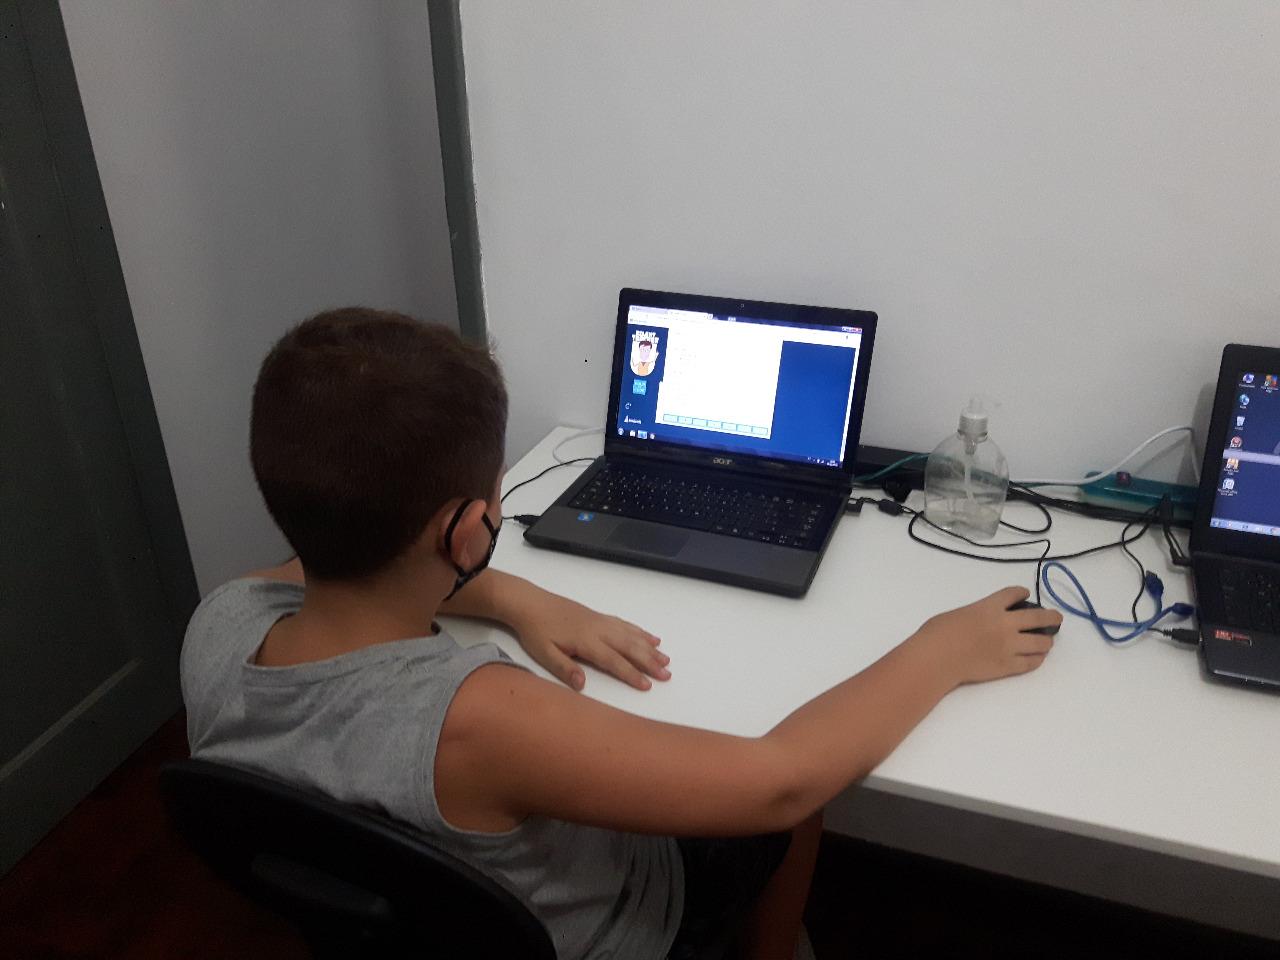 CURSO DE ROBÓTICA EDUCACIONAL EM RESENDE - RJ